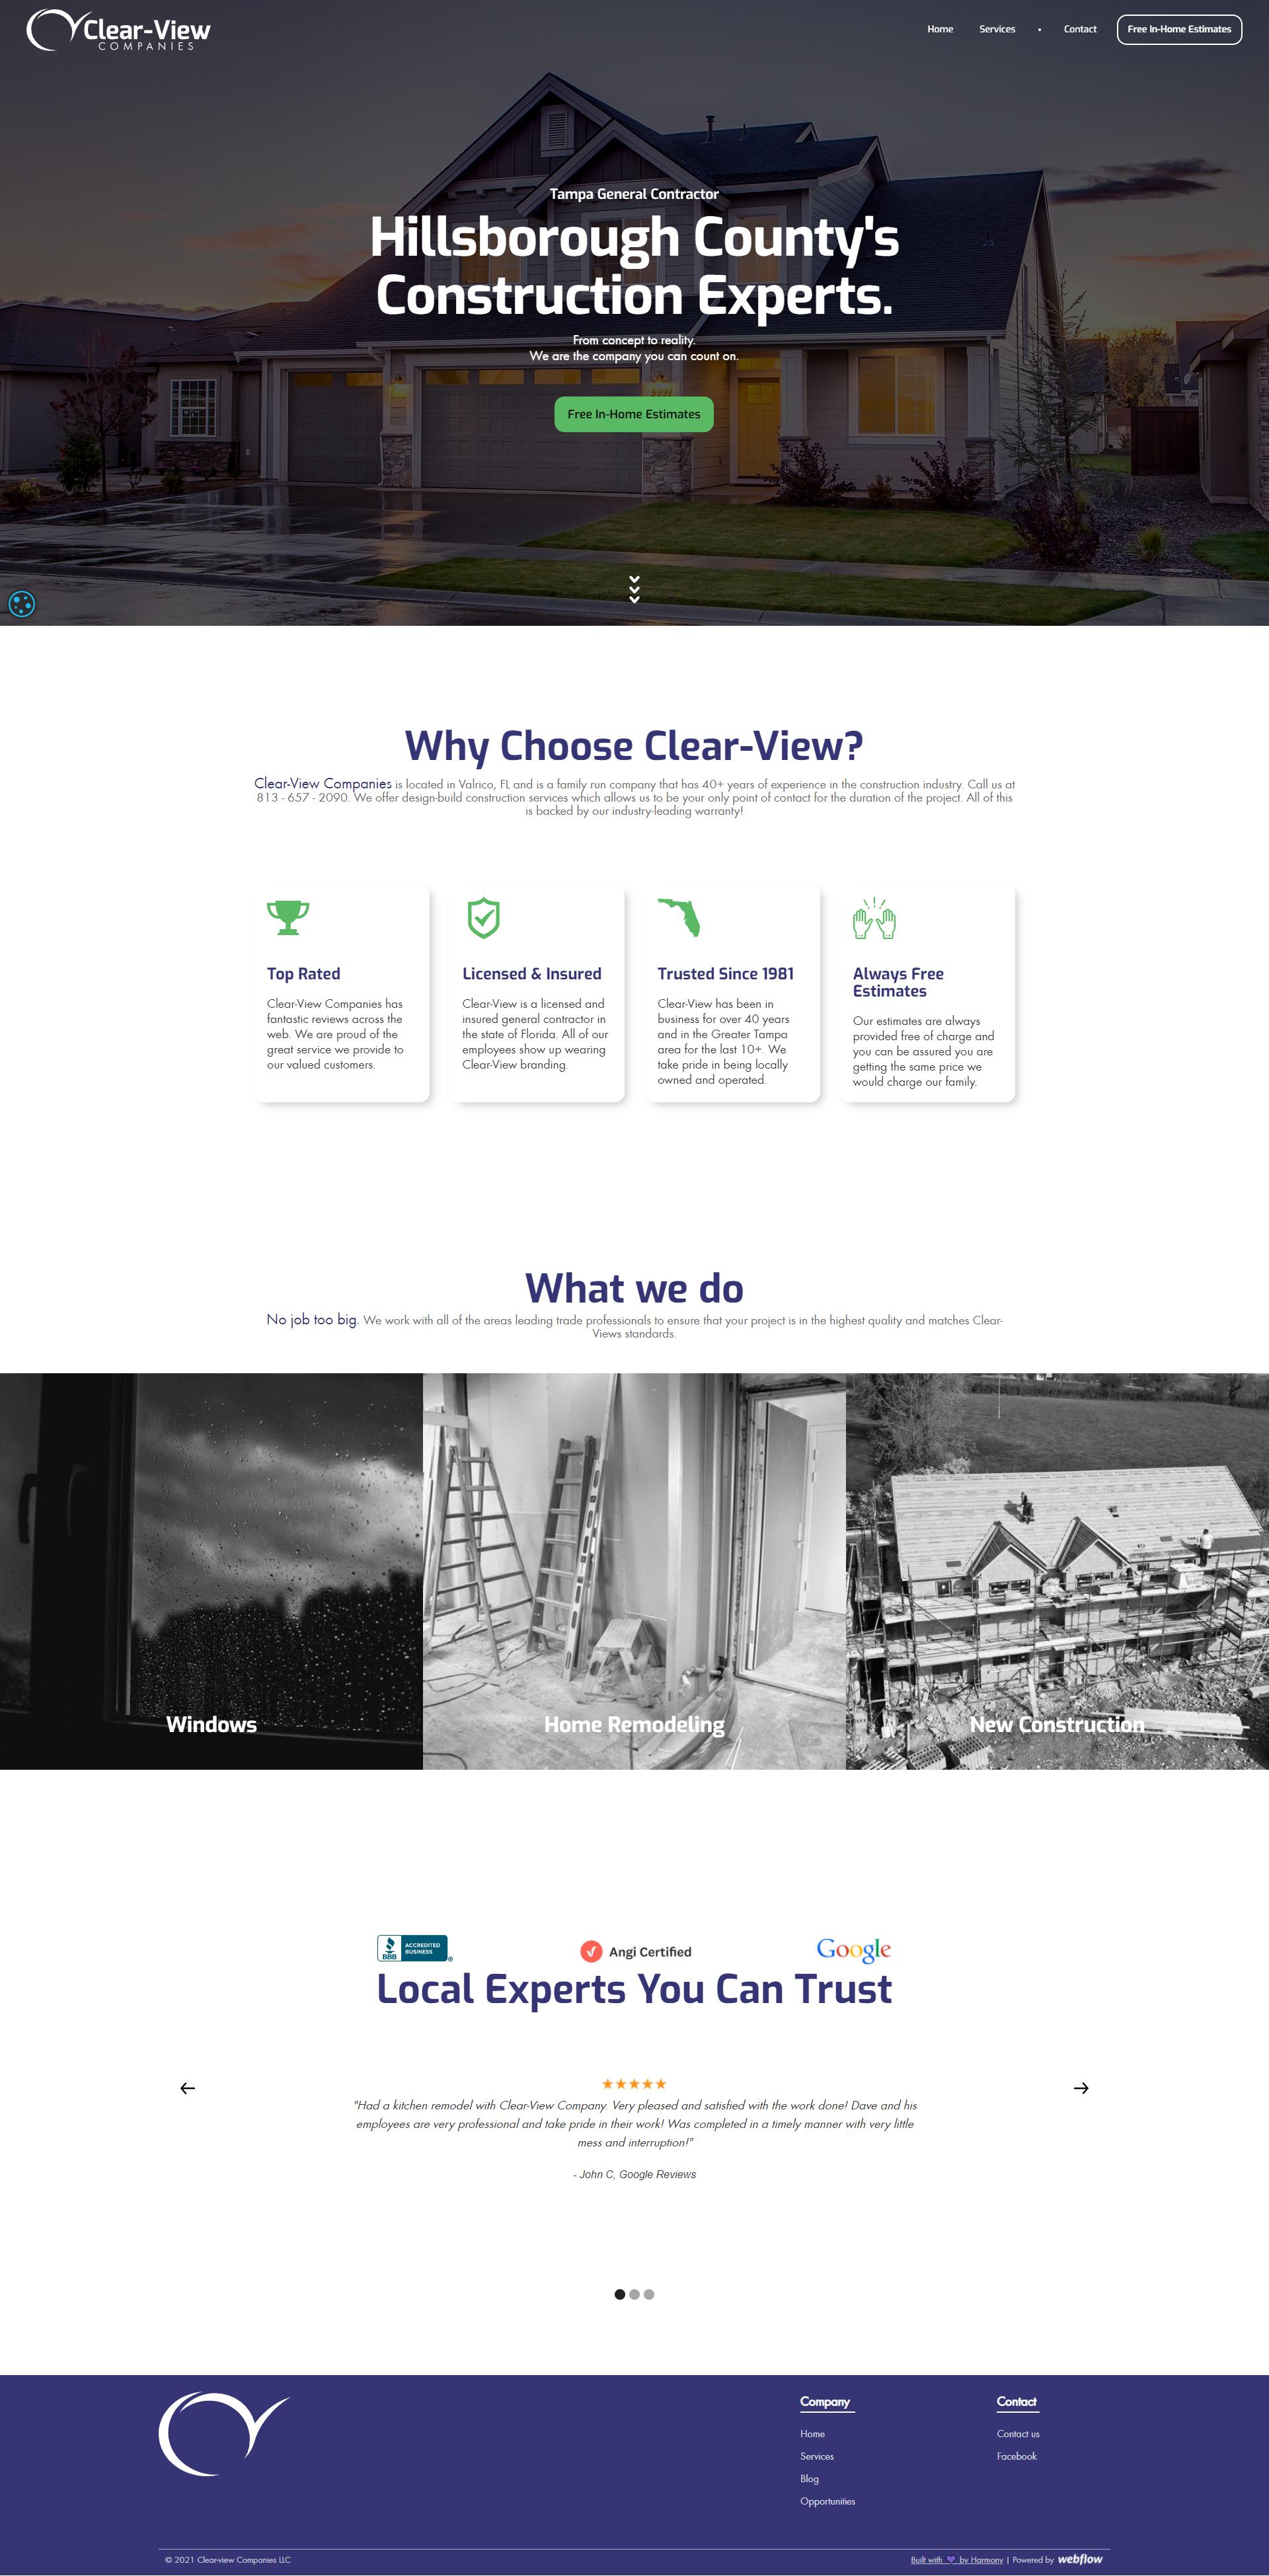 Clear-View Companies